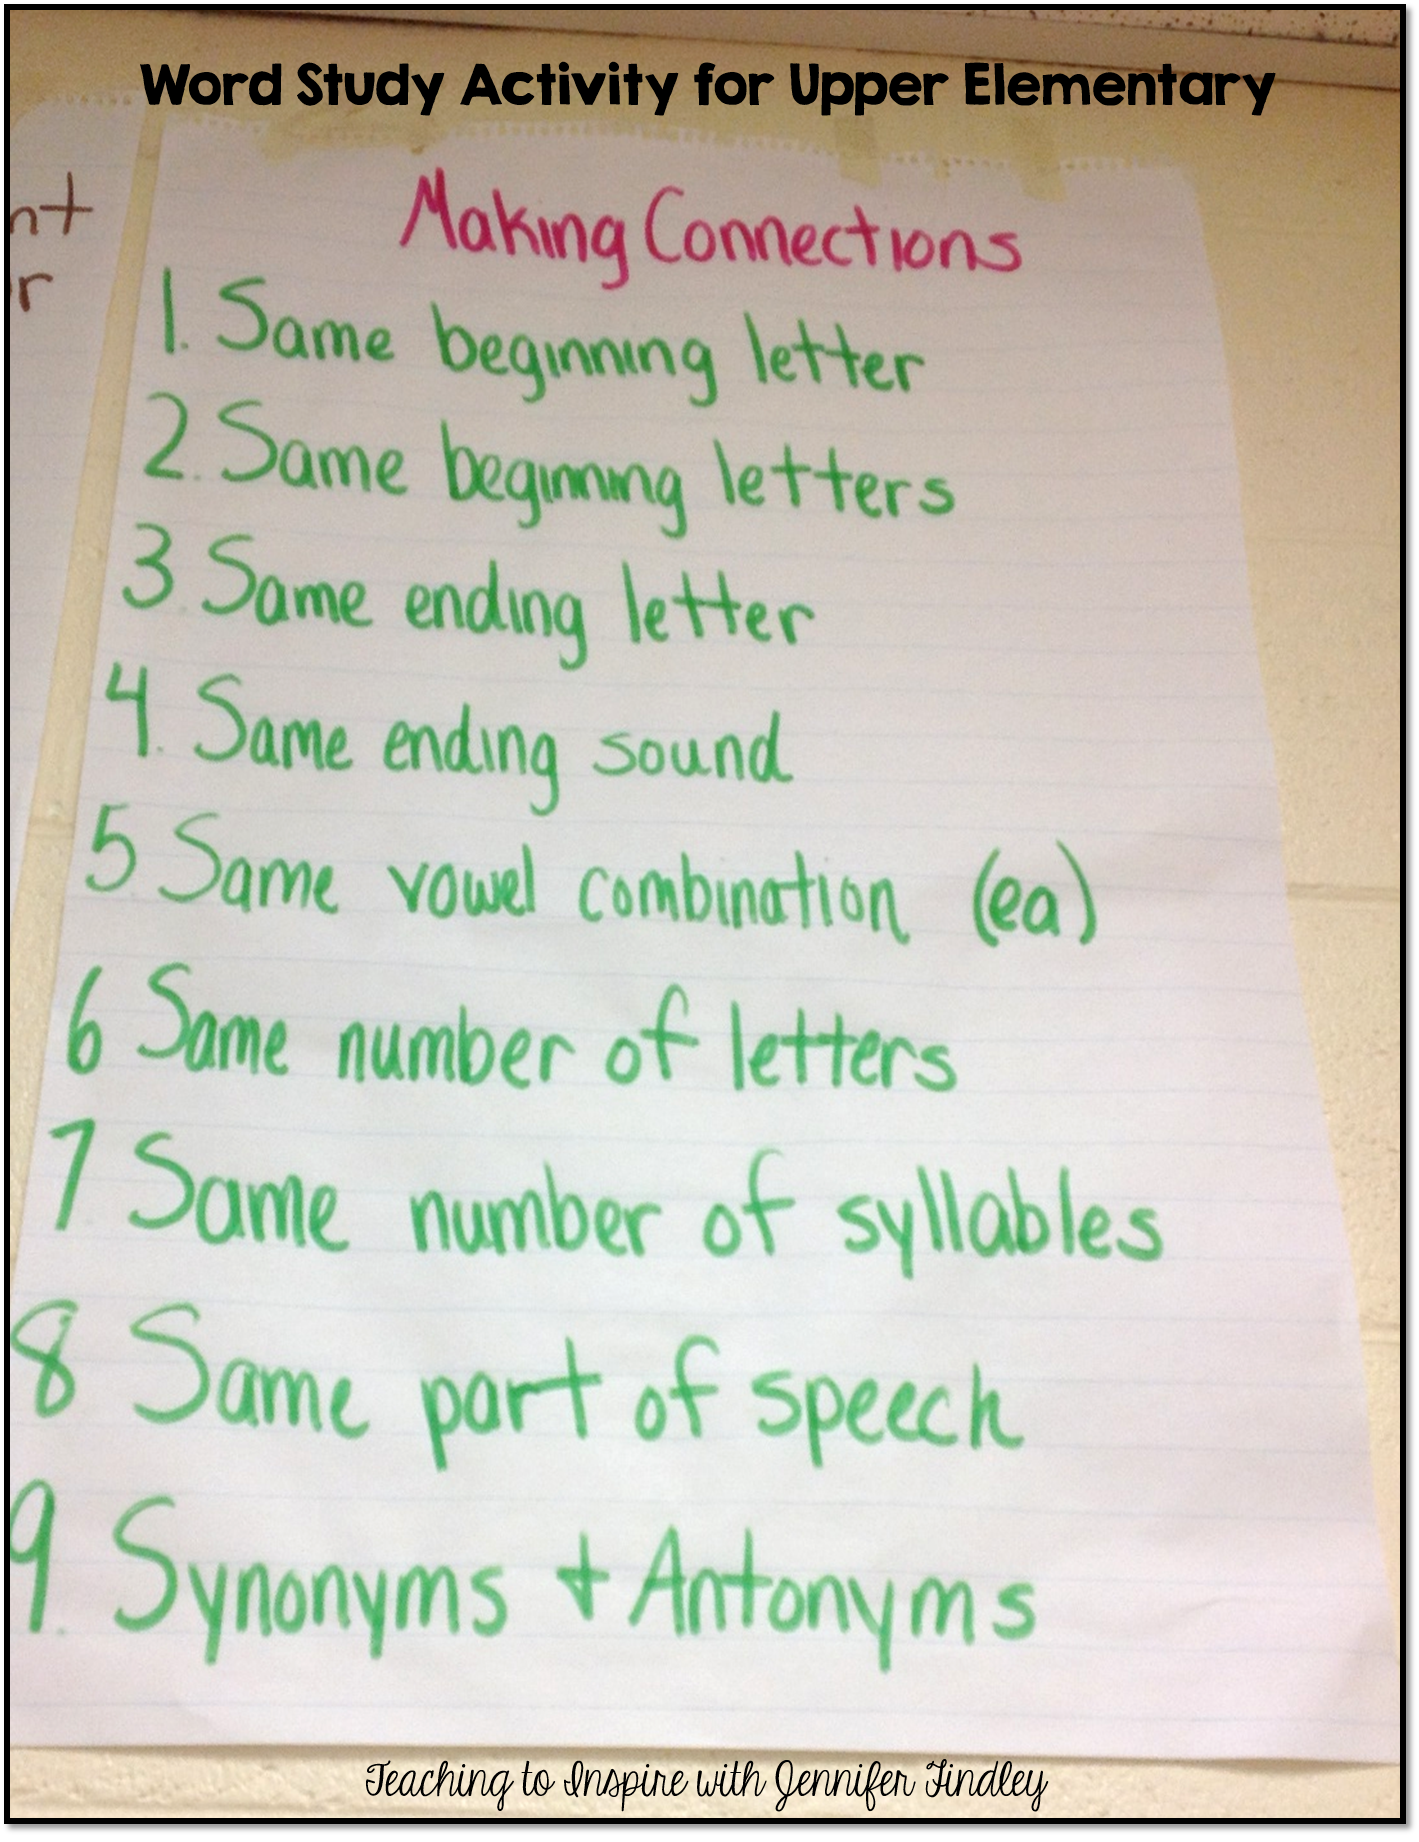 Word Study Chart